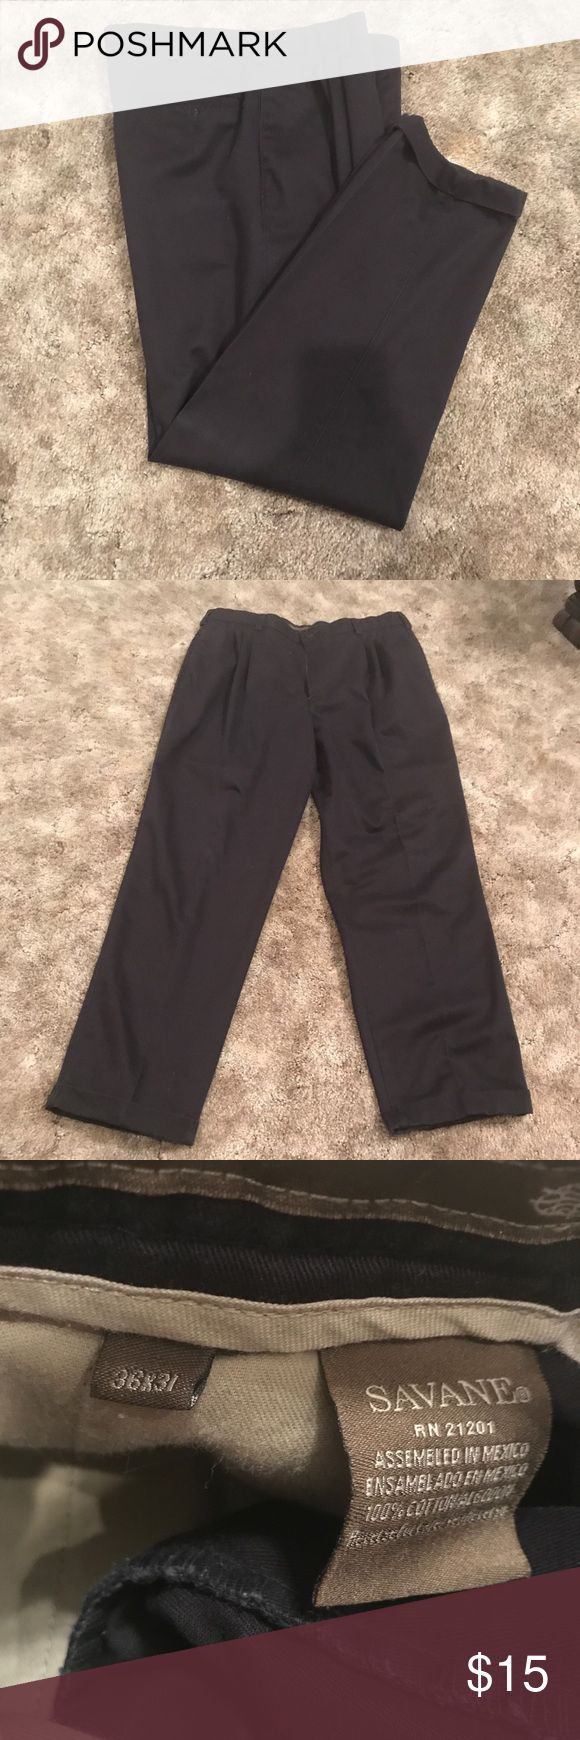 "Men's Savane dress pants Gently worn! Black pleated front dress pants. Length: 31"" 100% Cotton Savane Pants Dress"